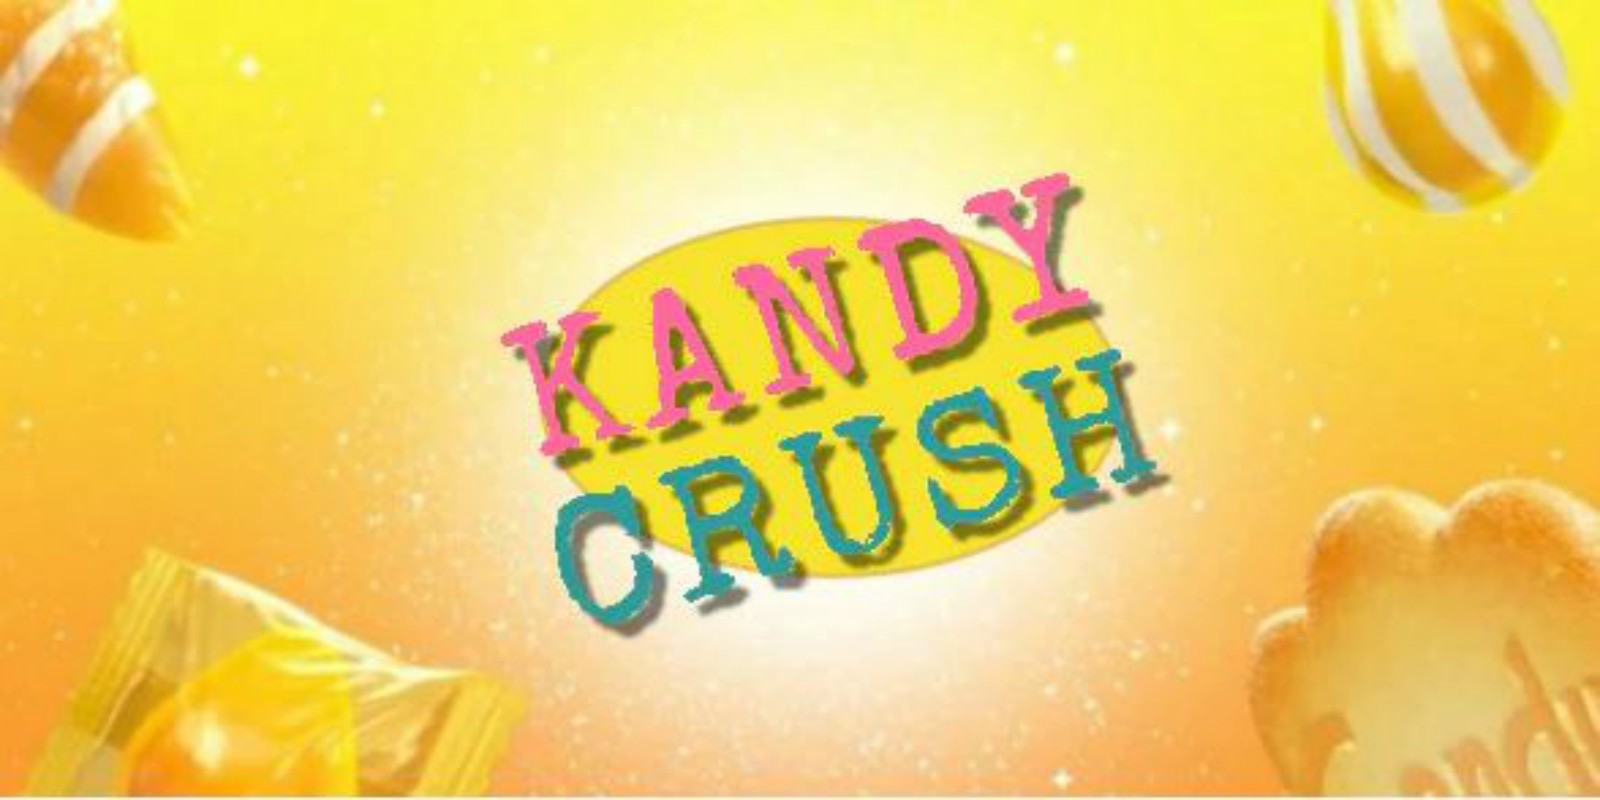 Kandy Crush - HTML5 JavaScript Game